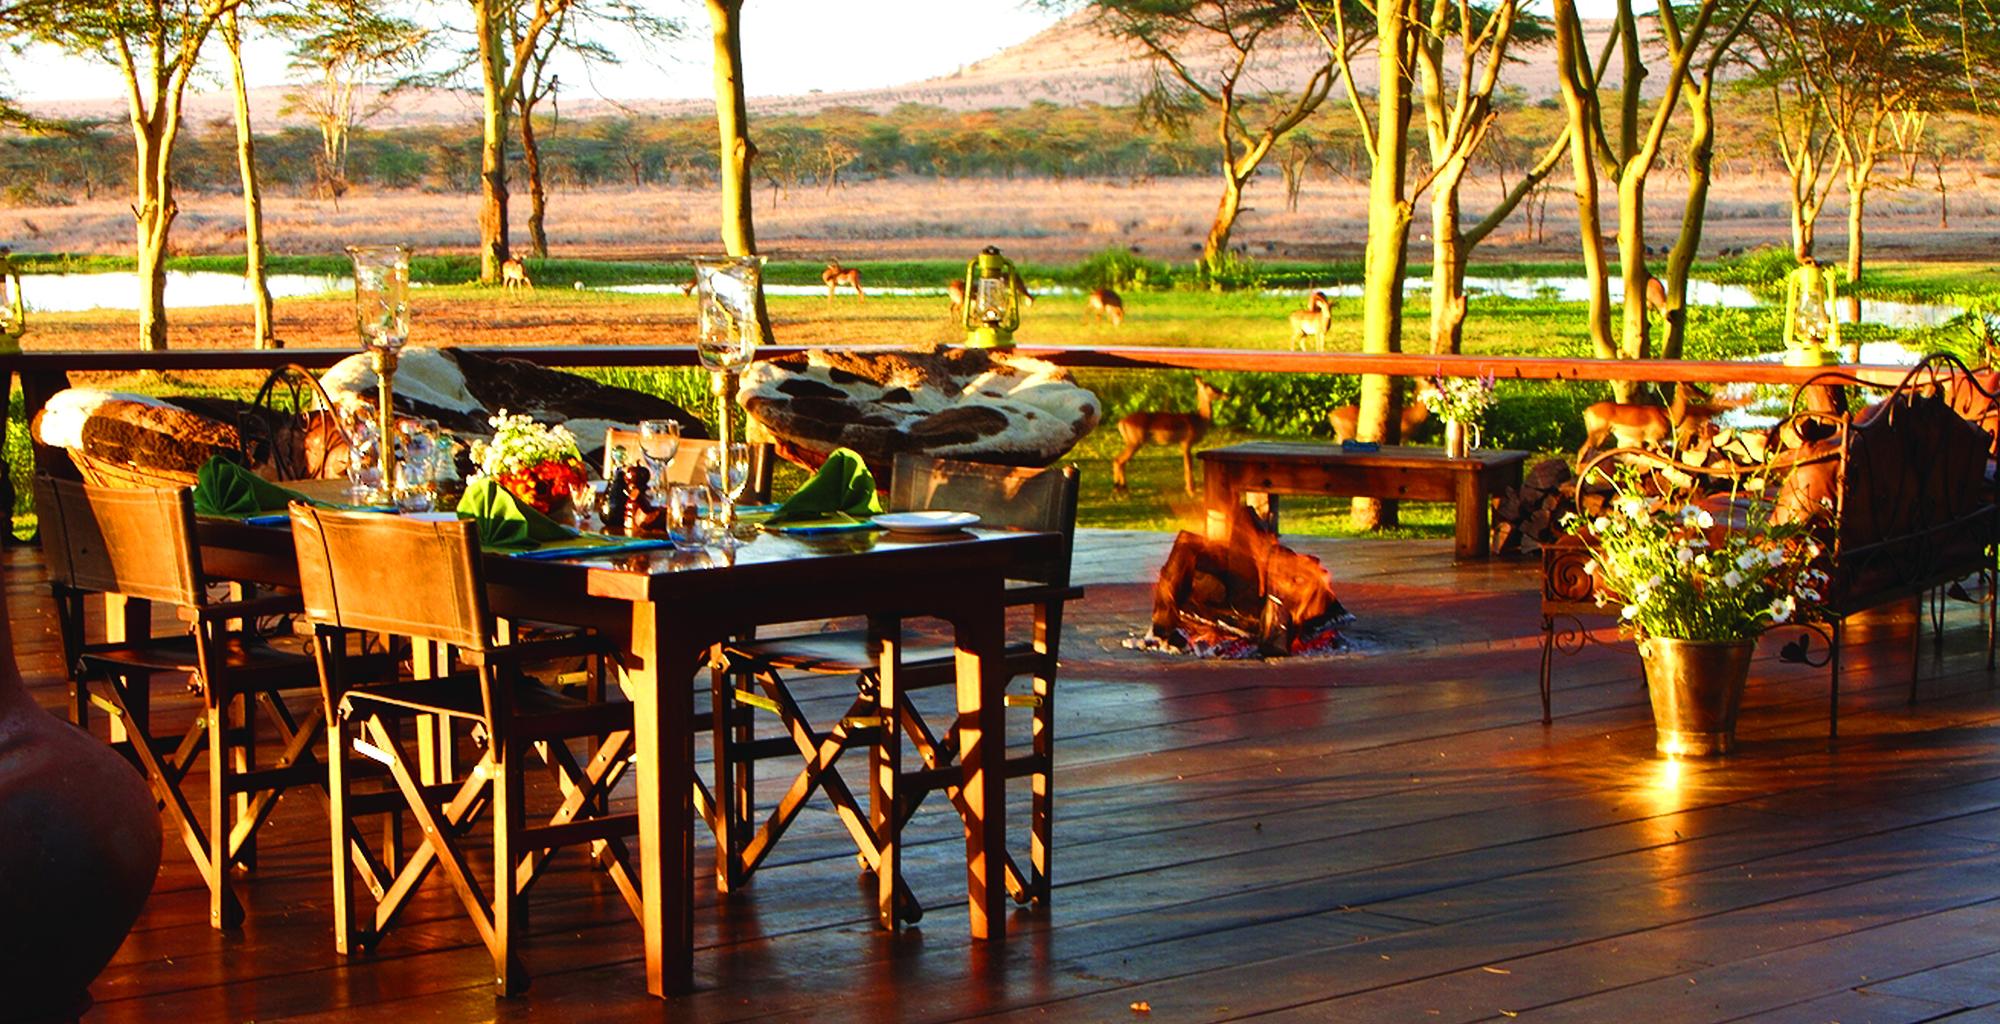 Kenya-Sirikoi-Willies-Camp-Deck